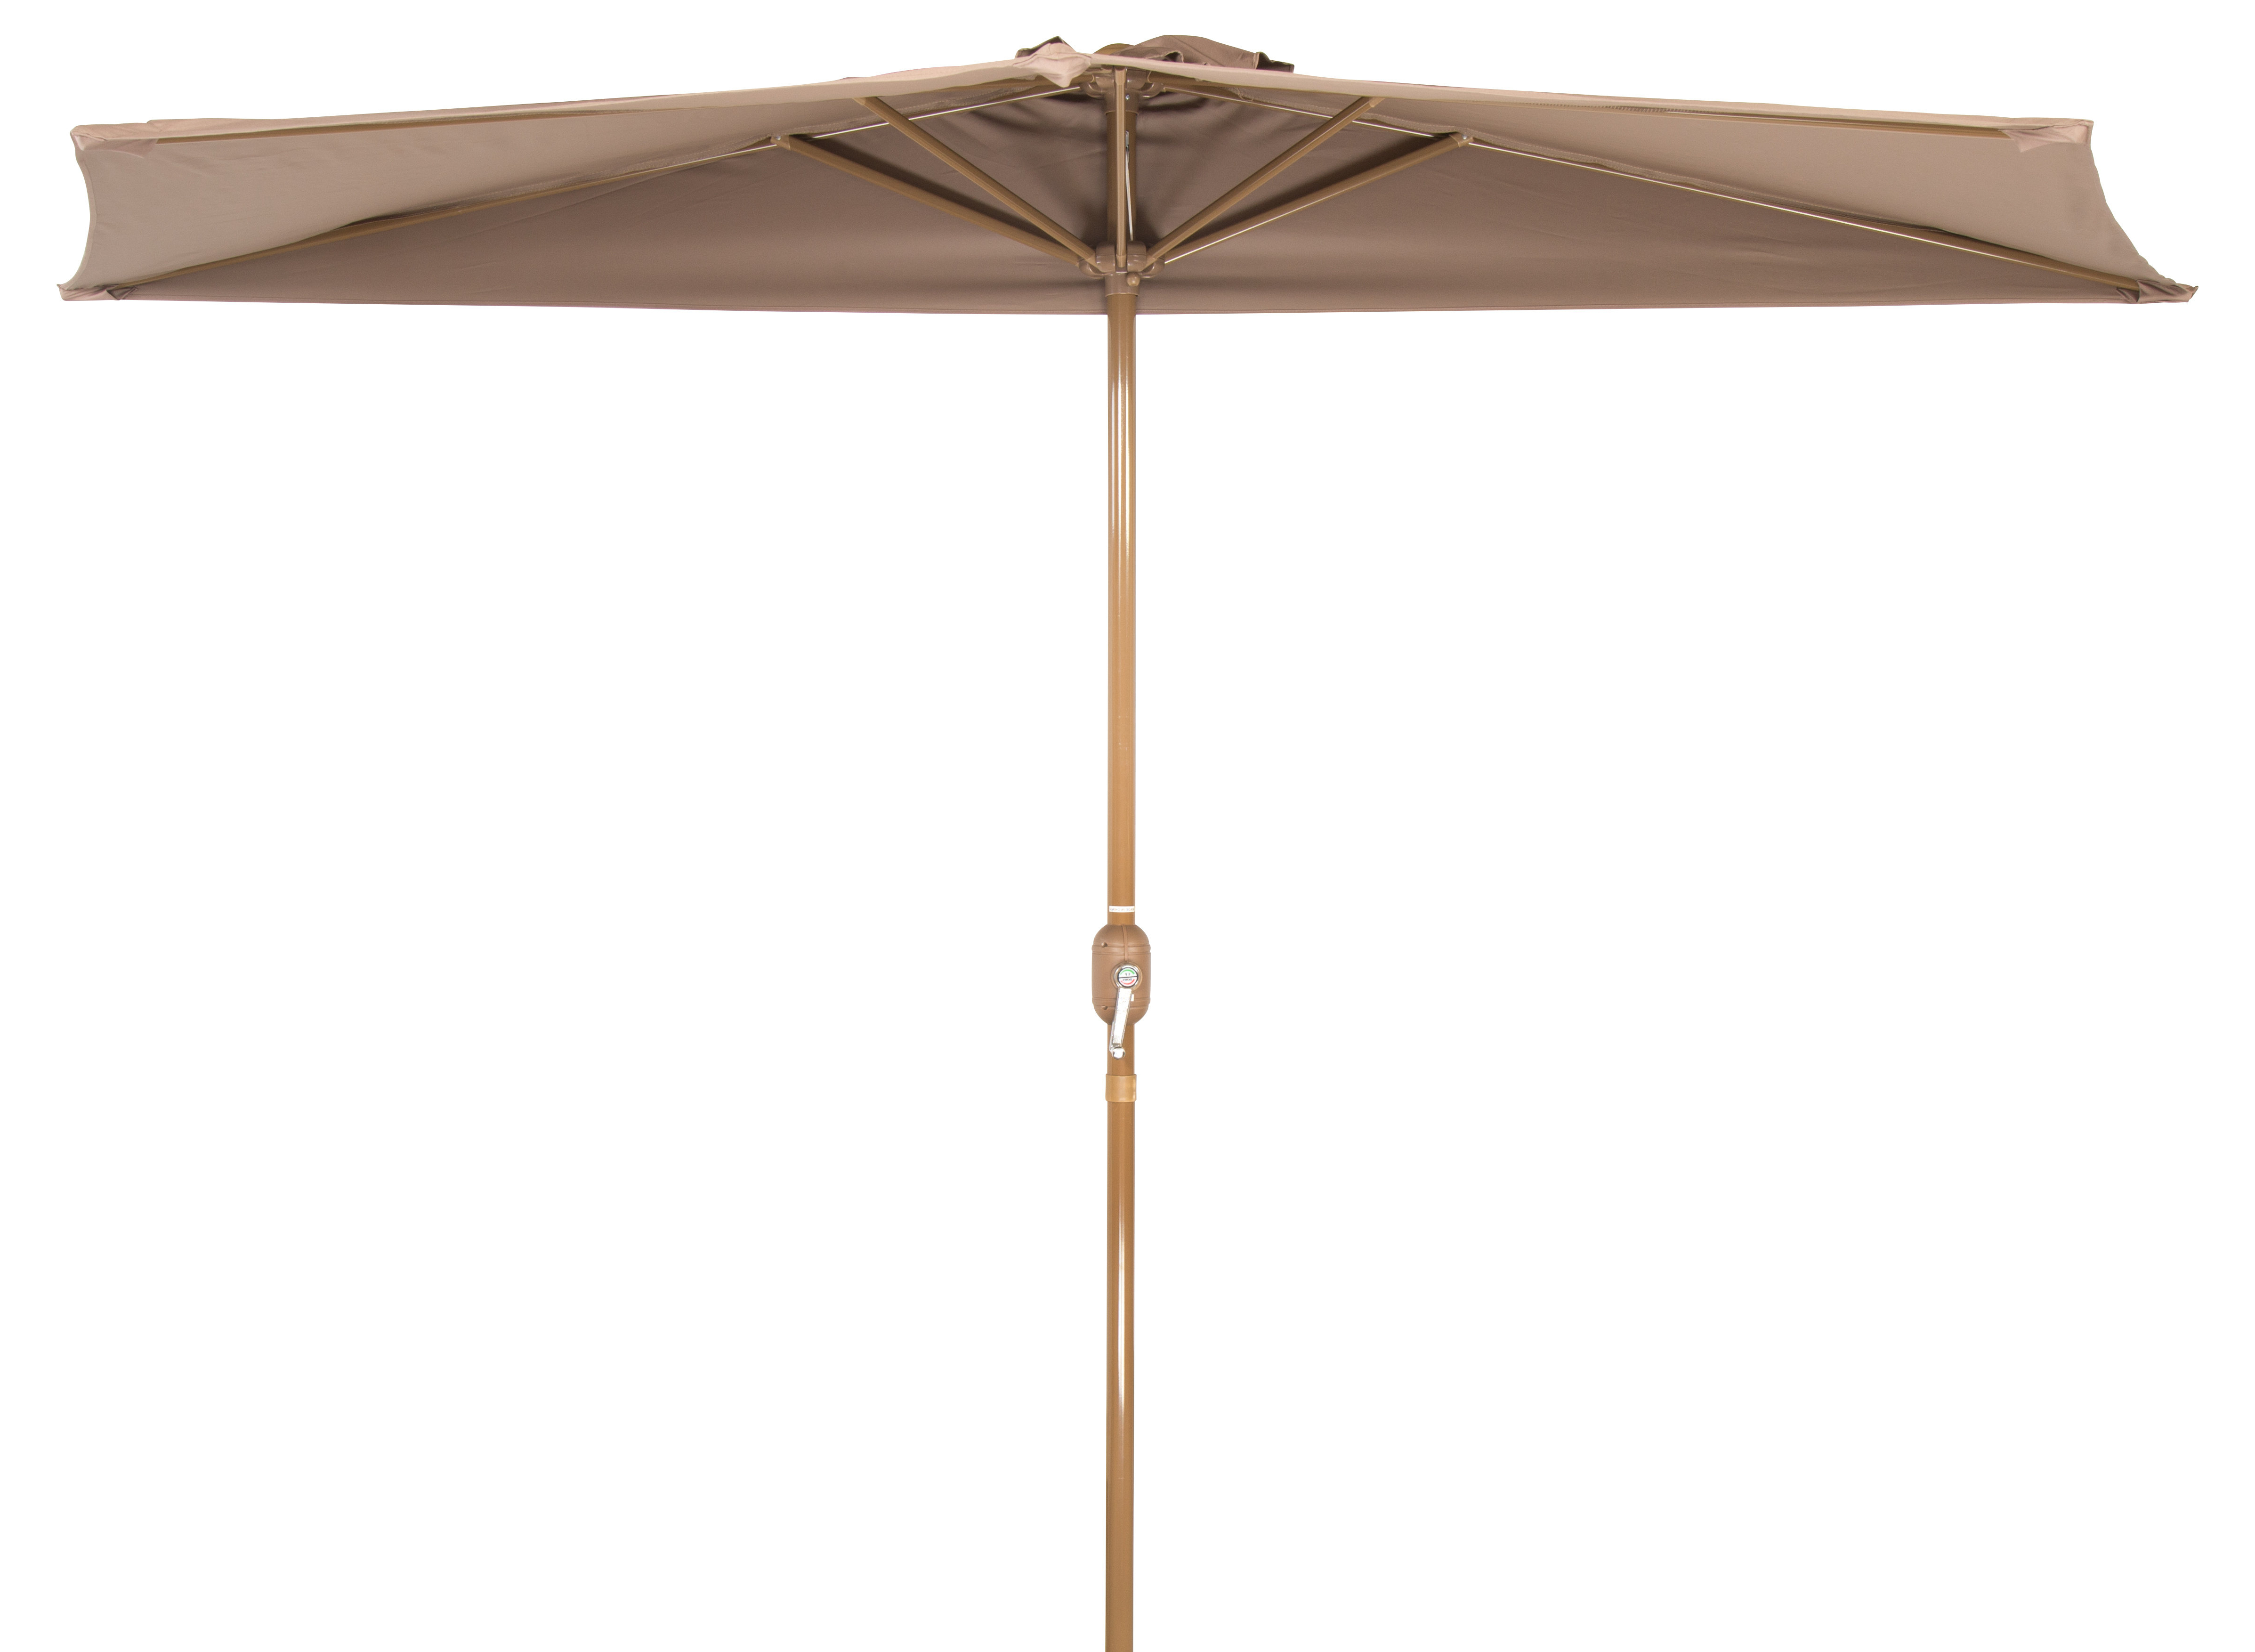 Hwang Patio Half 4.5' X 9' Rectangular Market Umbrella With Most Up To Date Alondra Ultimate Wondershade 5Beach Umbrellas (Gallery 13 of 20)